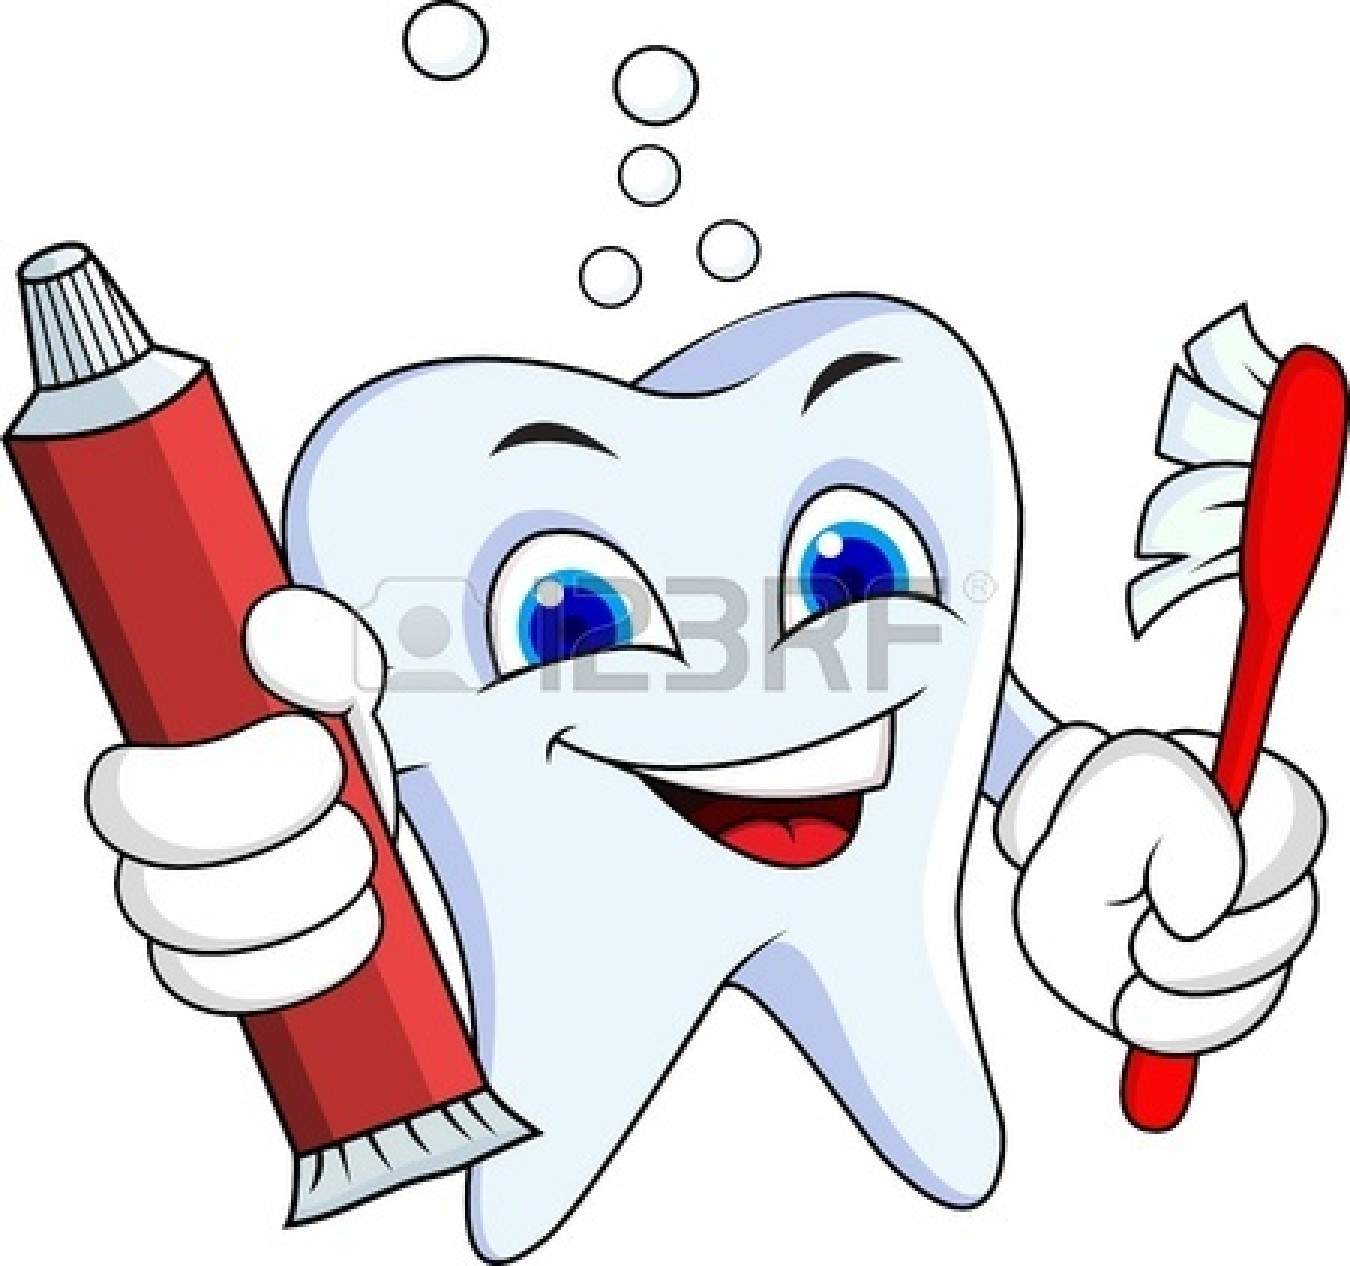 Dental clipart. Dentistry panda free images